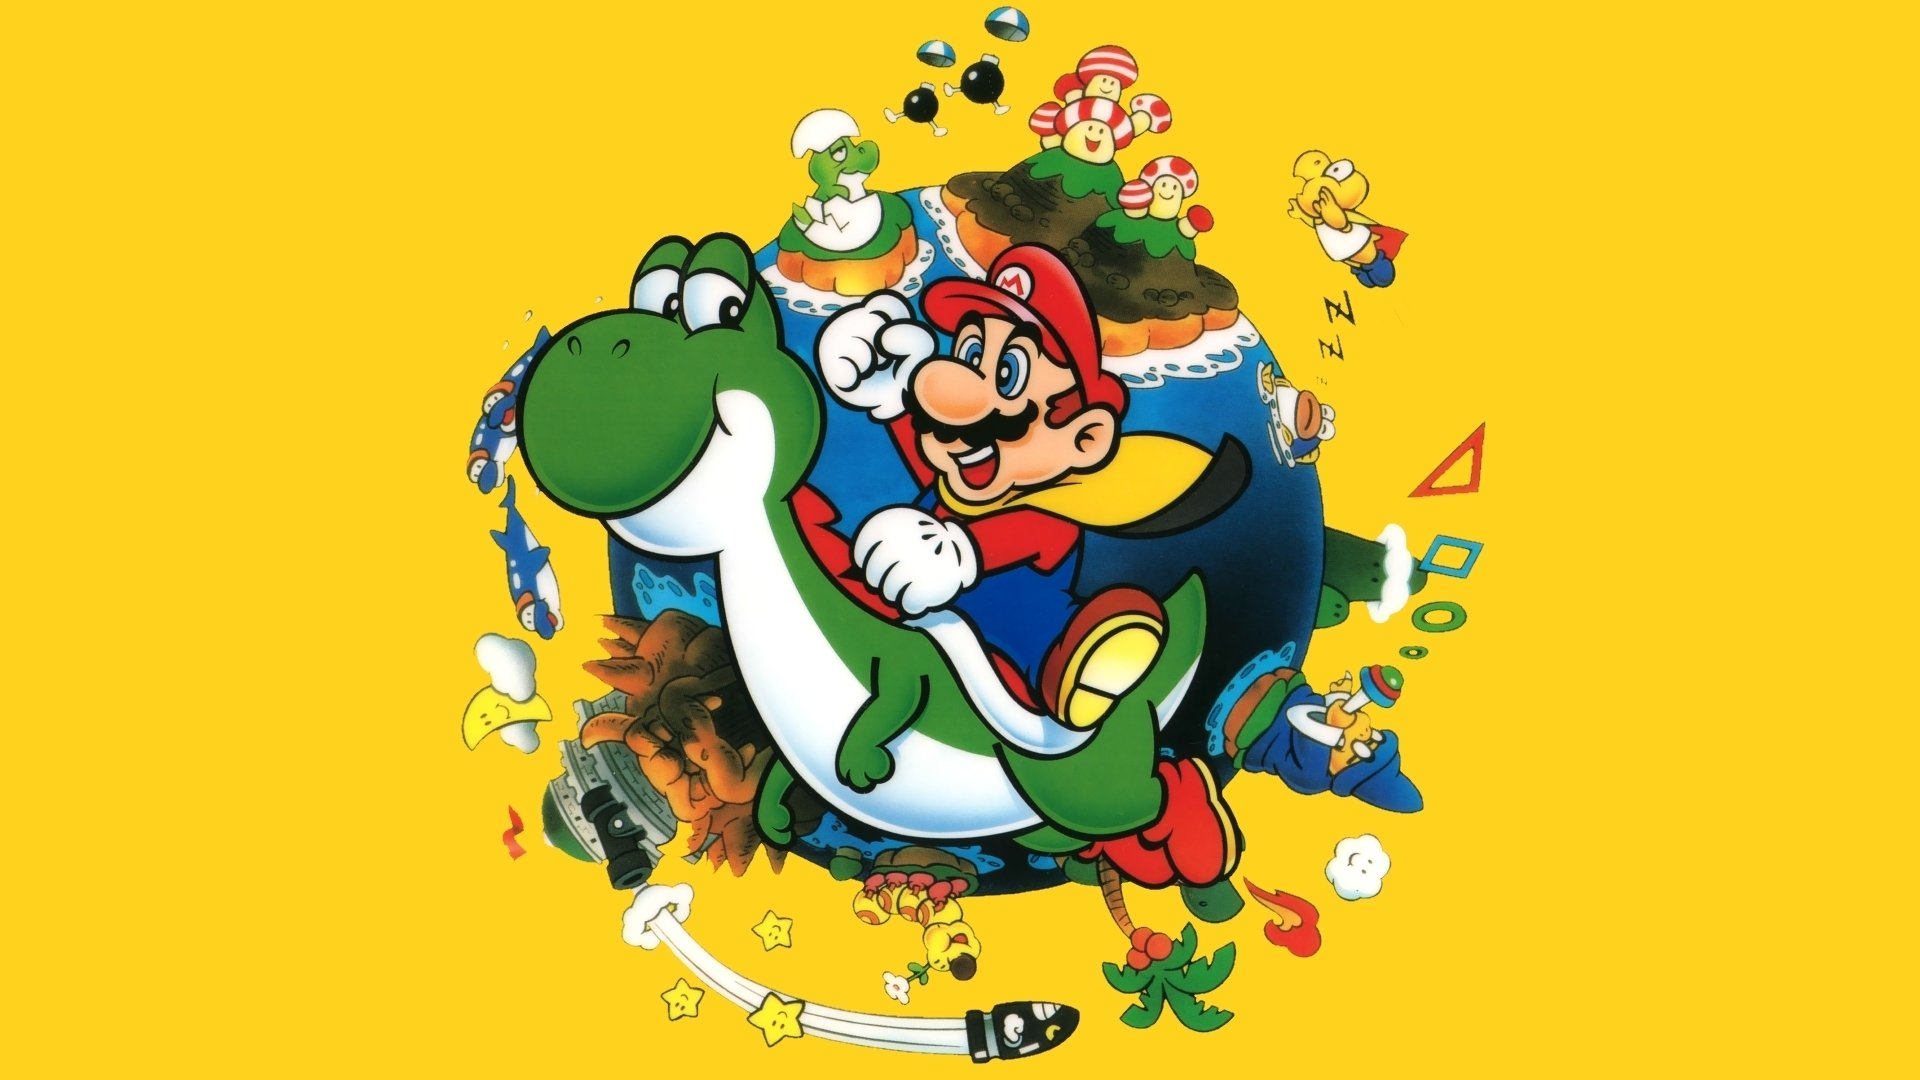 Mario Desktop Backgrounds: Super Mario World Wallpaper